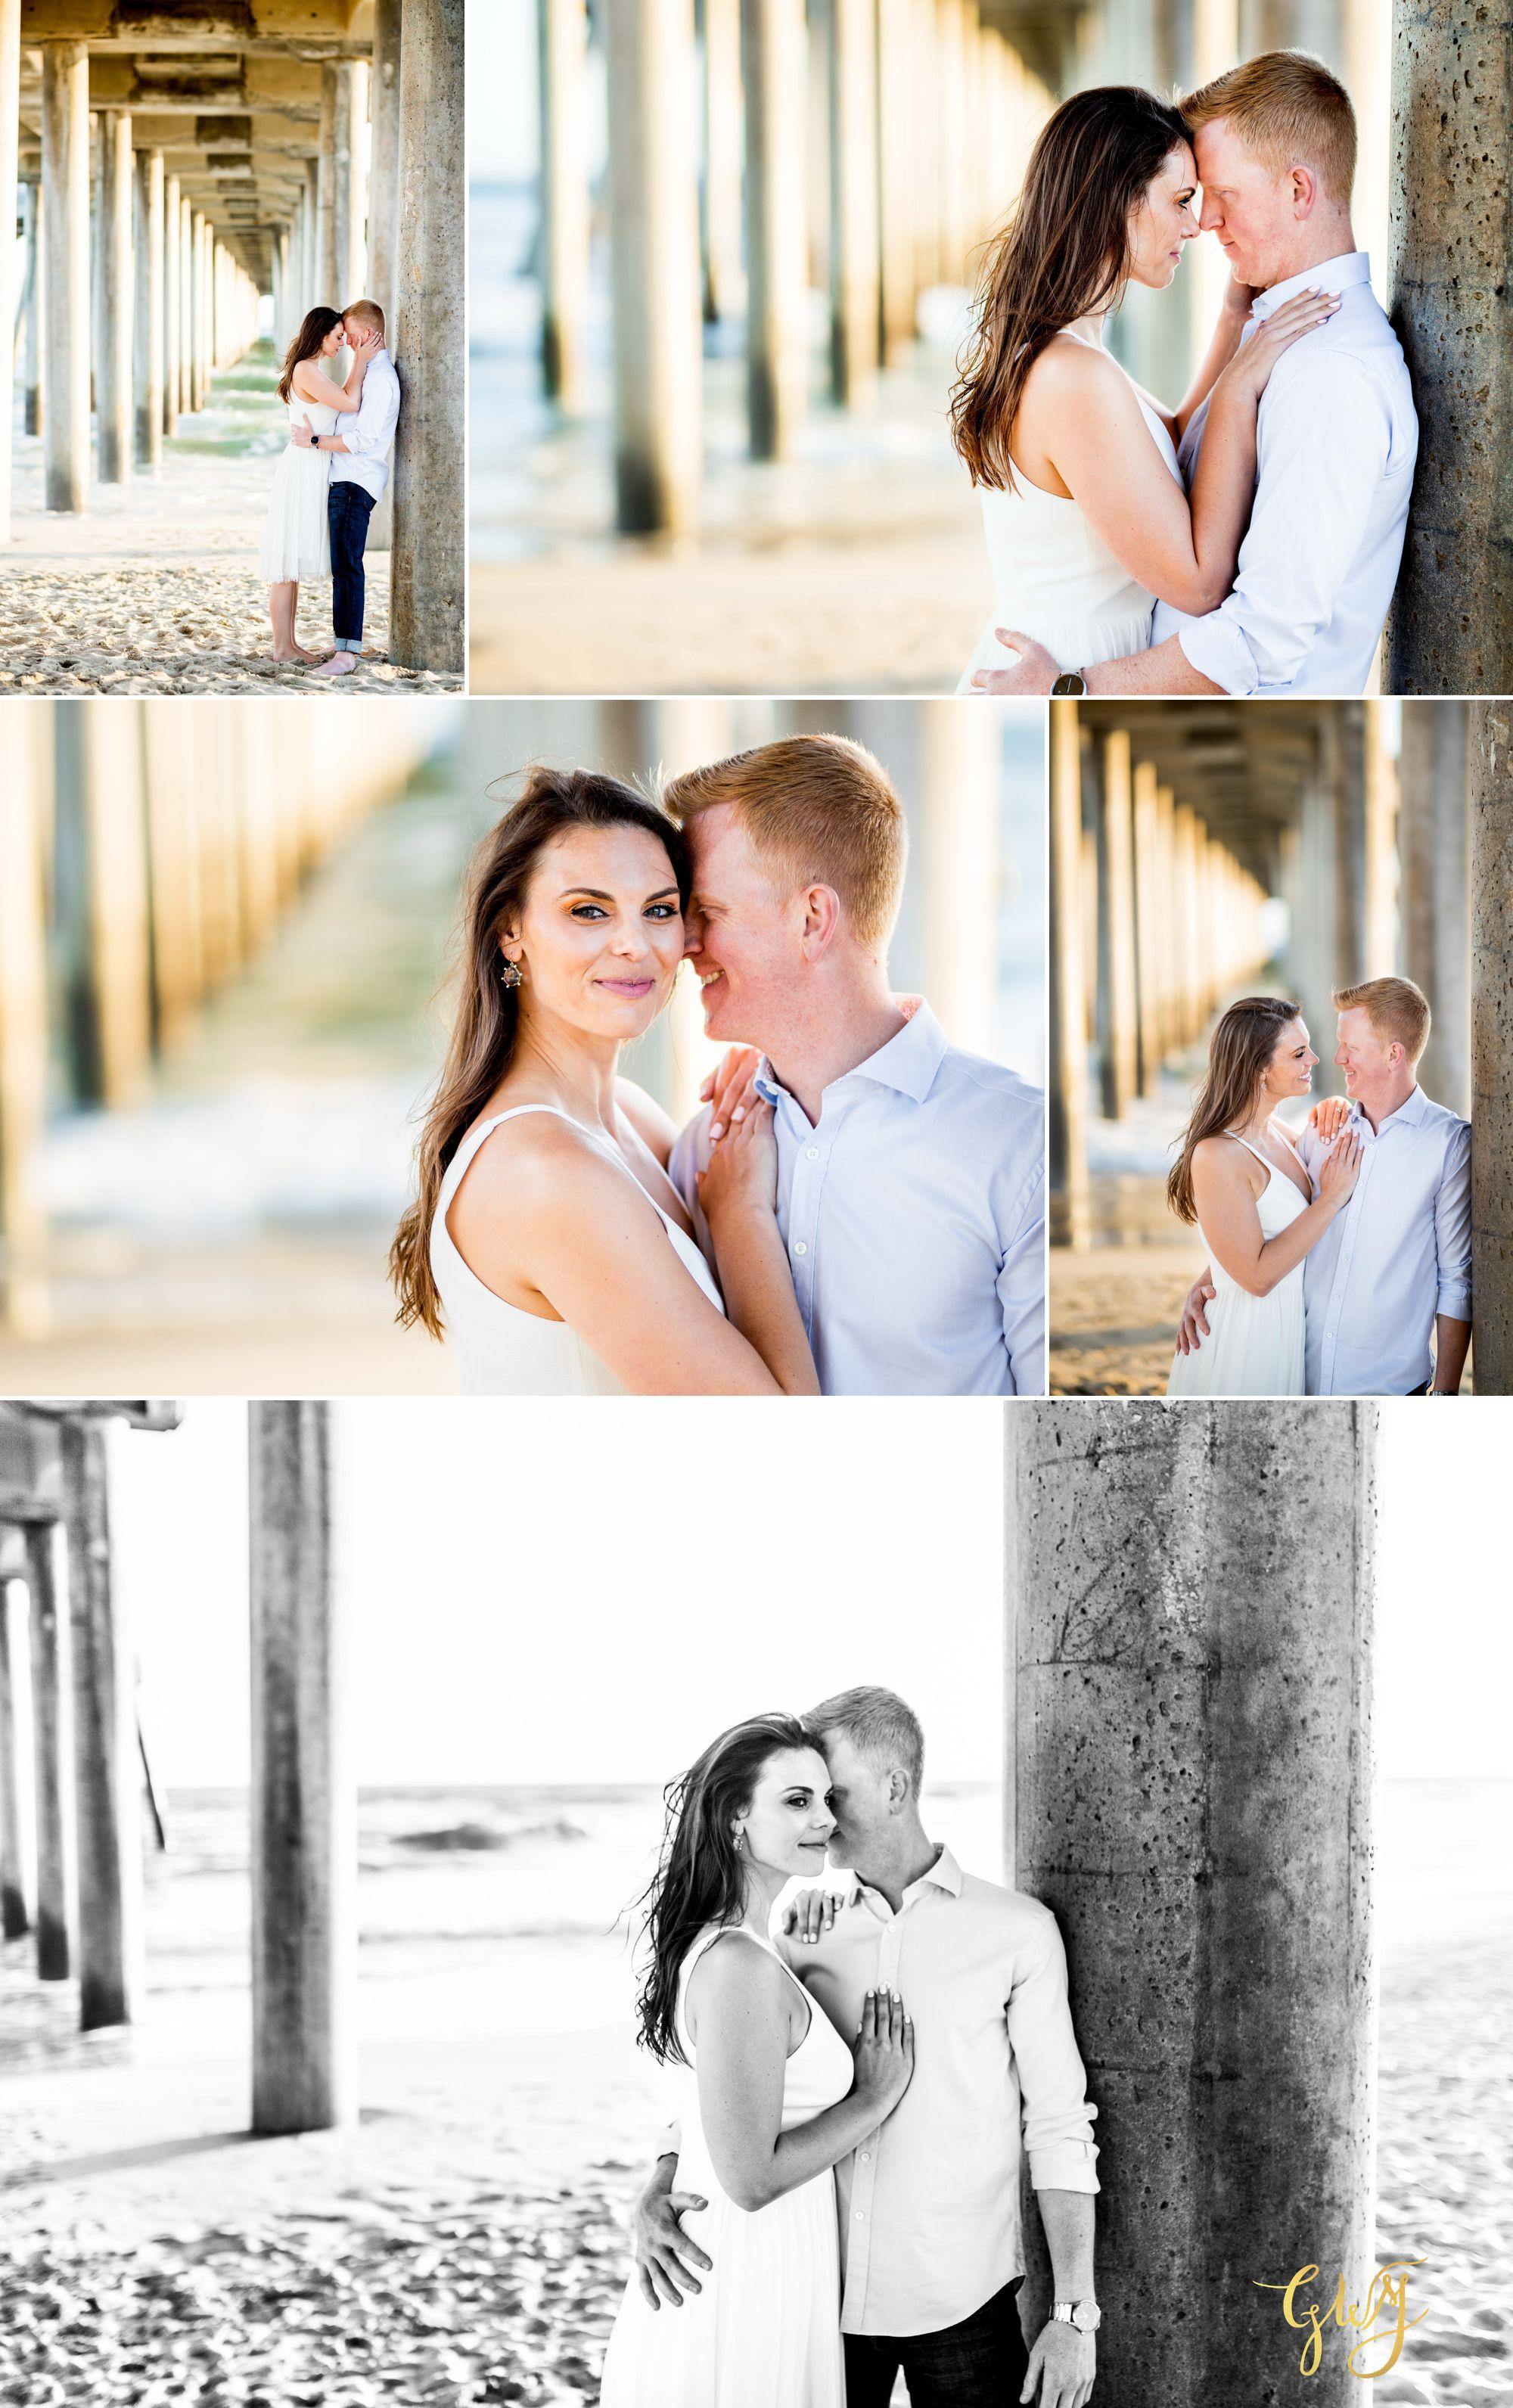 2019.05.27 - Ryley + Tolalf Romantic Summer Huntington Beach + HB Central Park Engagement Session by Glass Woods Media 11.jpg